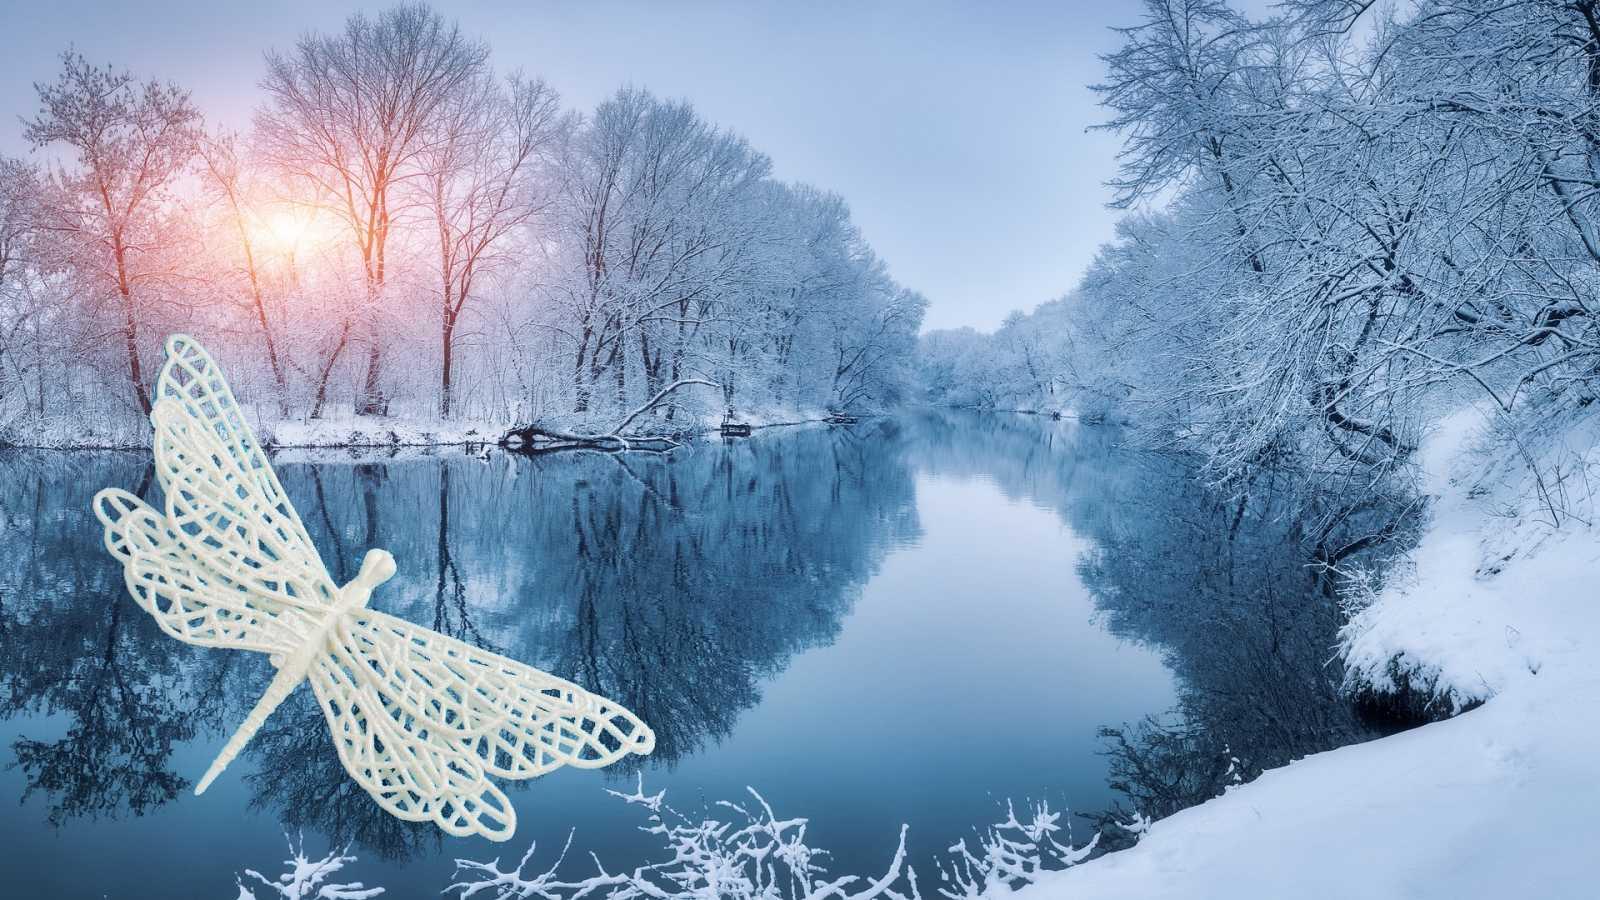 La LiBéLuLa - Nieve, nieve, nieve... - 13/01/21 - escuchar ahora